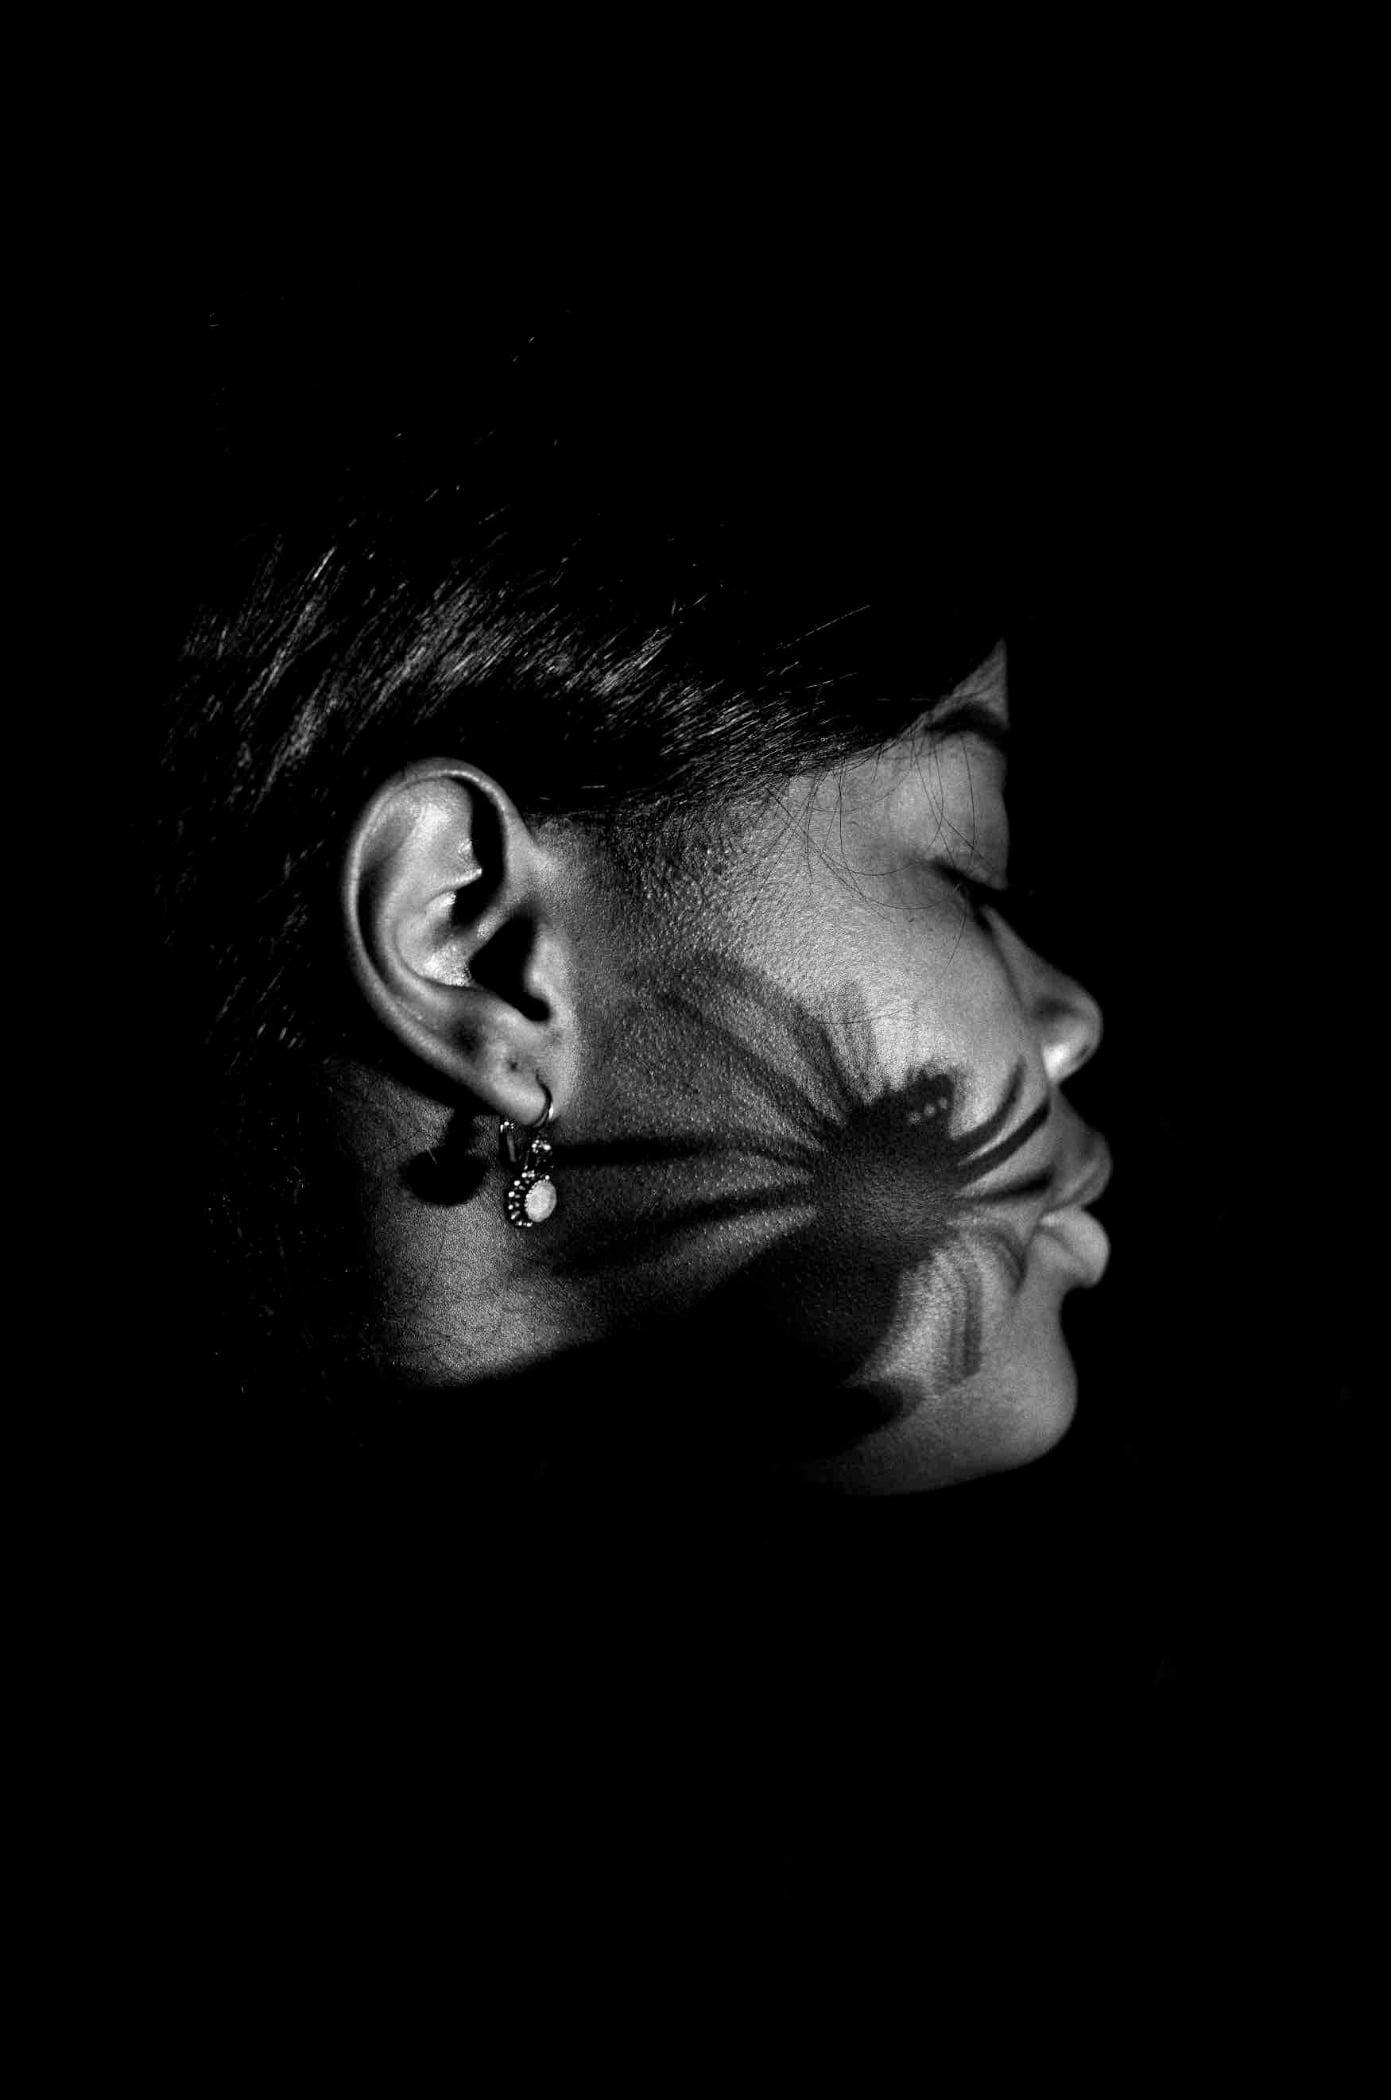 Monochrome photography, Body jewelry, Fashion accessory, Darkness, Style, Jewellery, Skin, Earrings, Ear